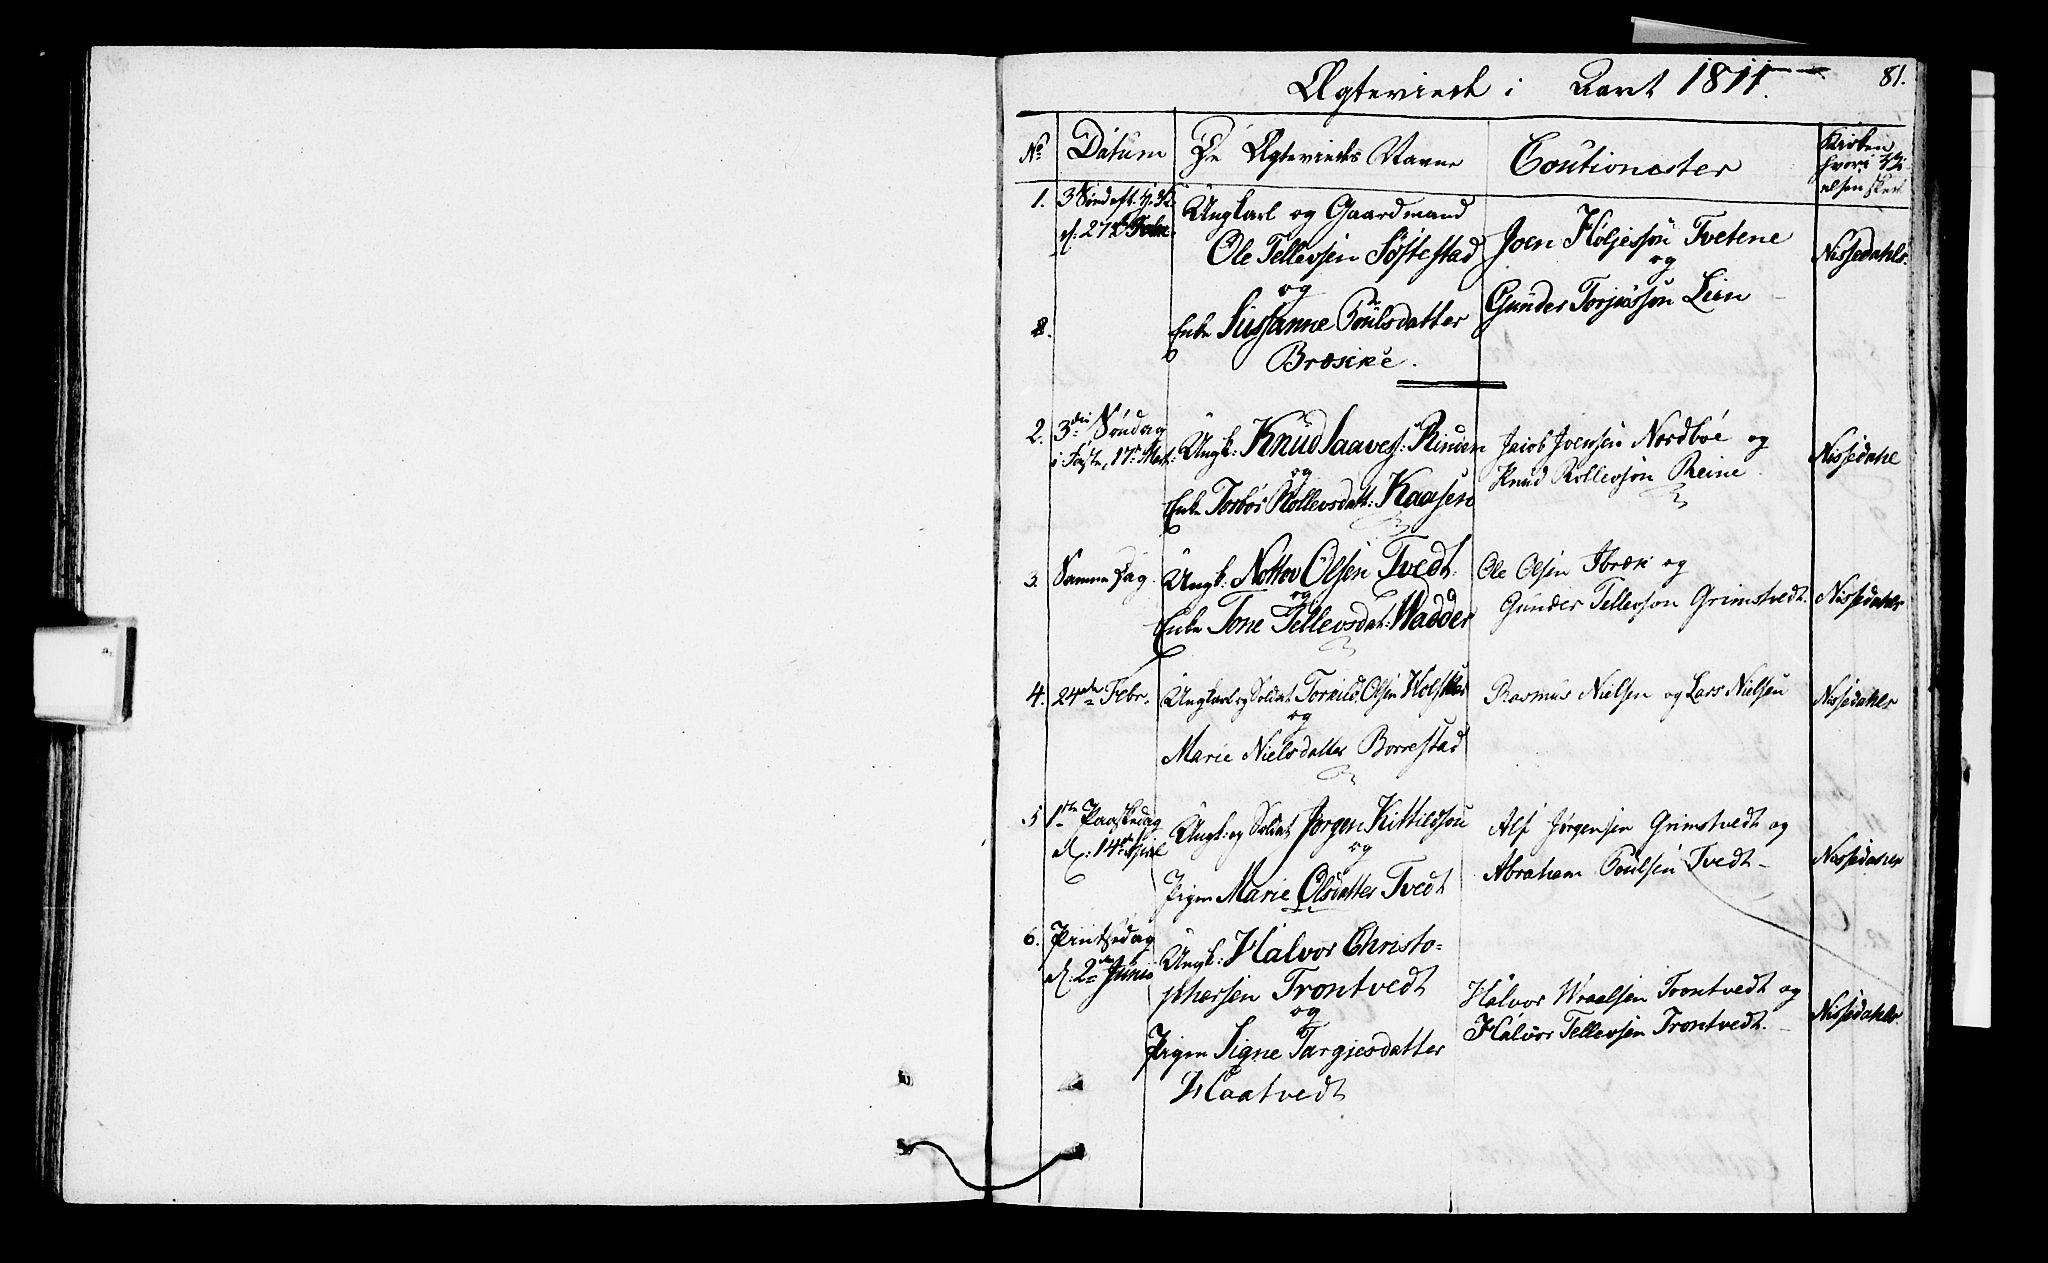 SAKO, Nissedal kirkebøker, F/Fa/L0001: Ministerialbok nr. I 1, 1811-1814, s. 81